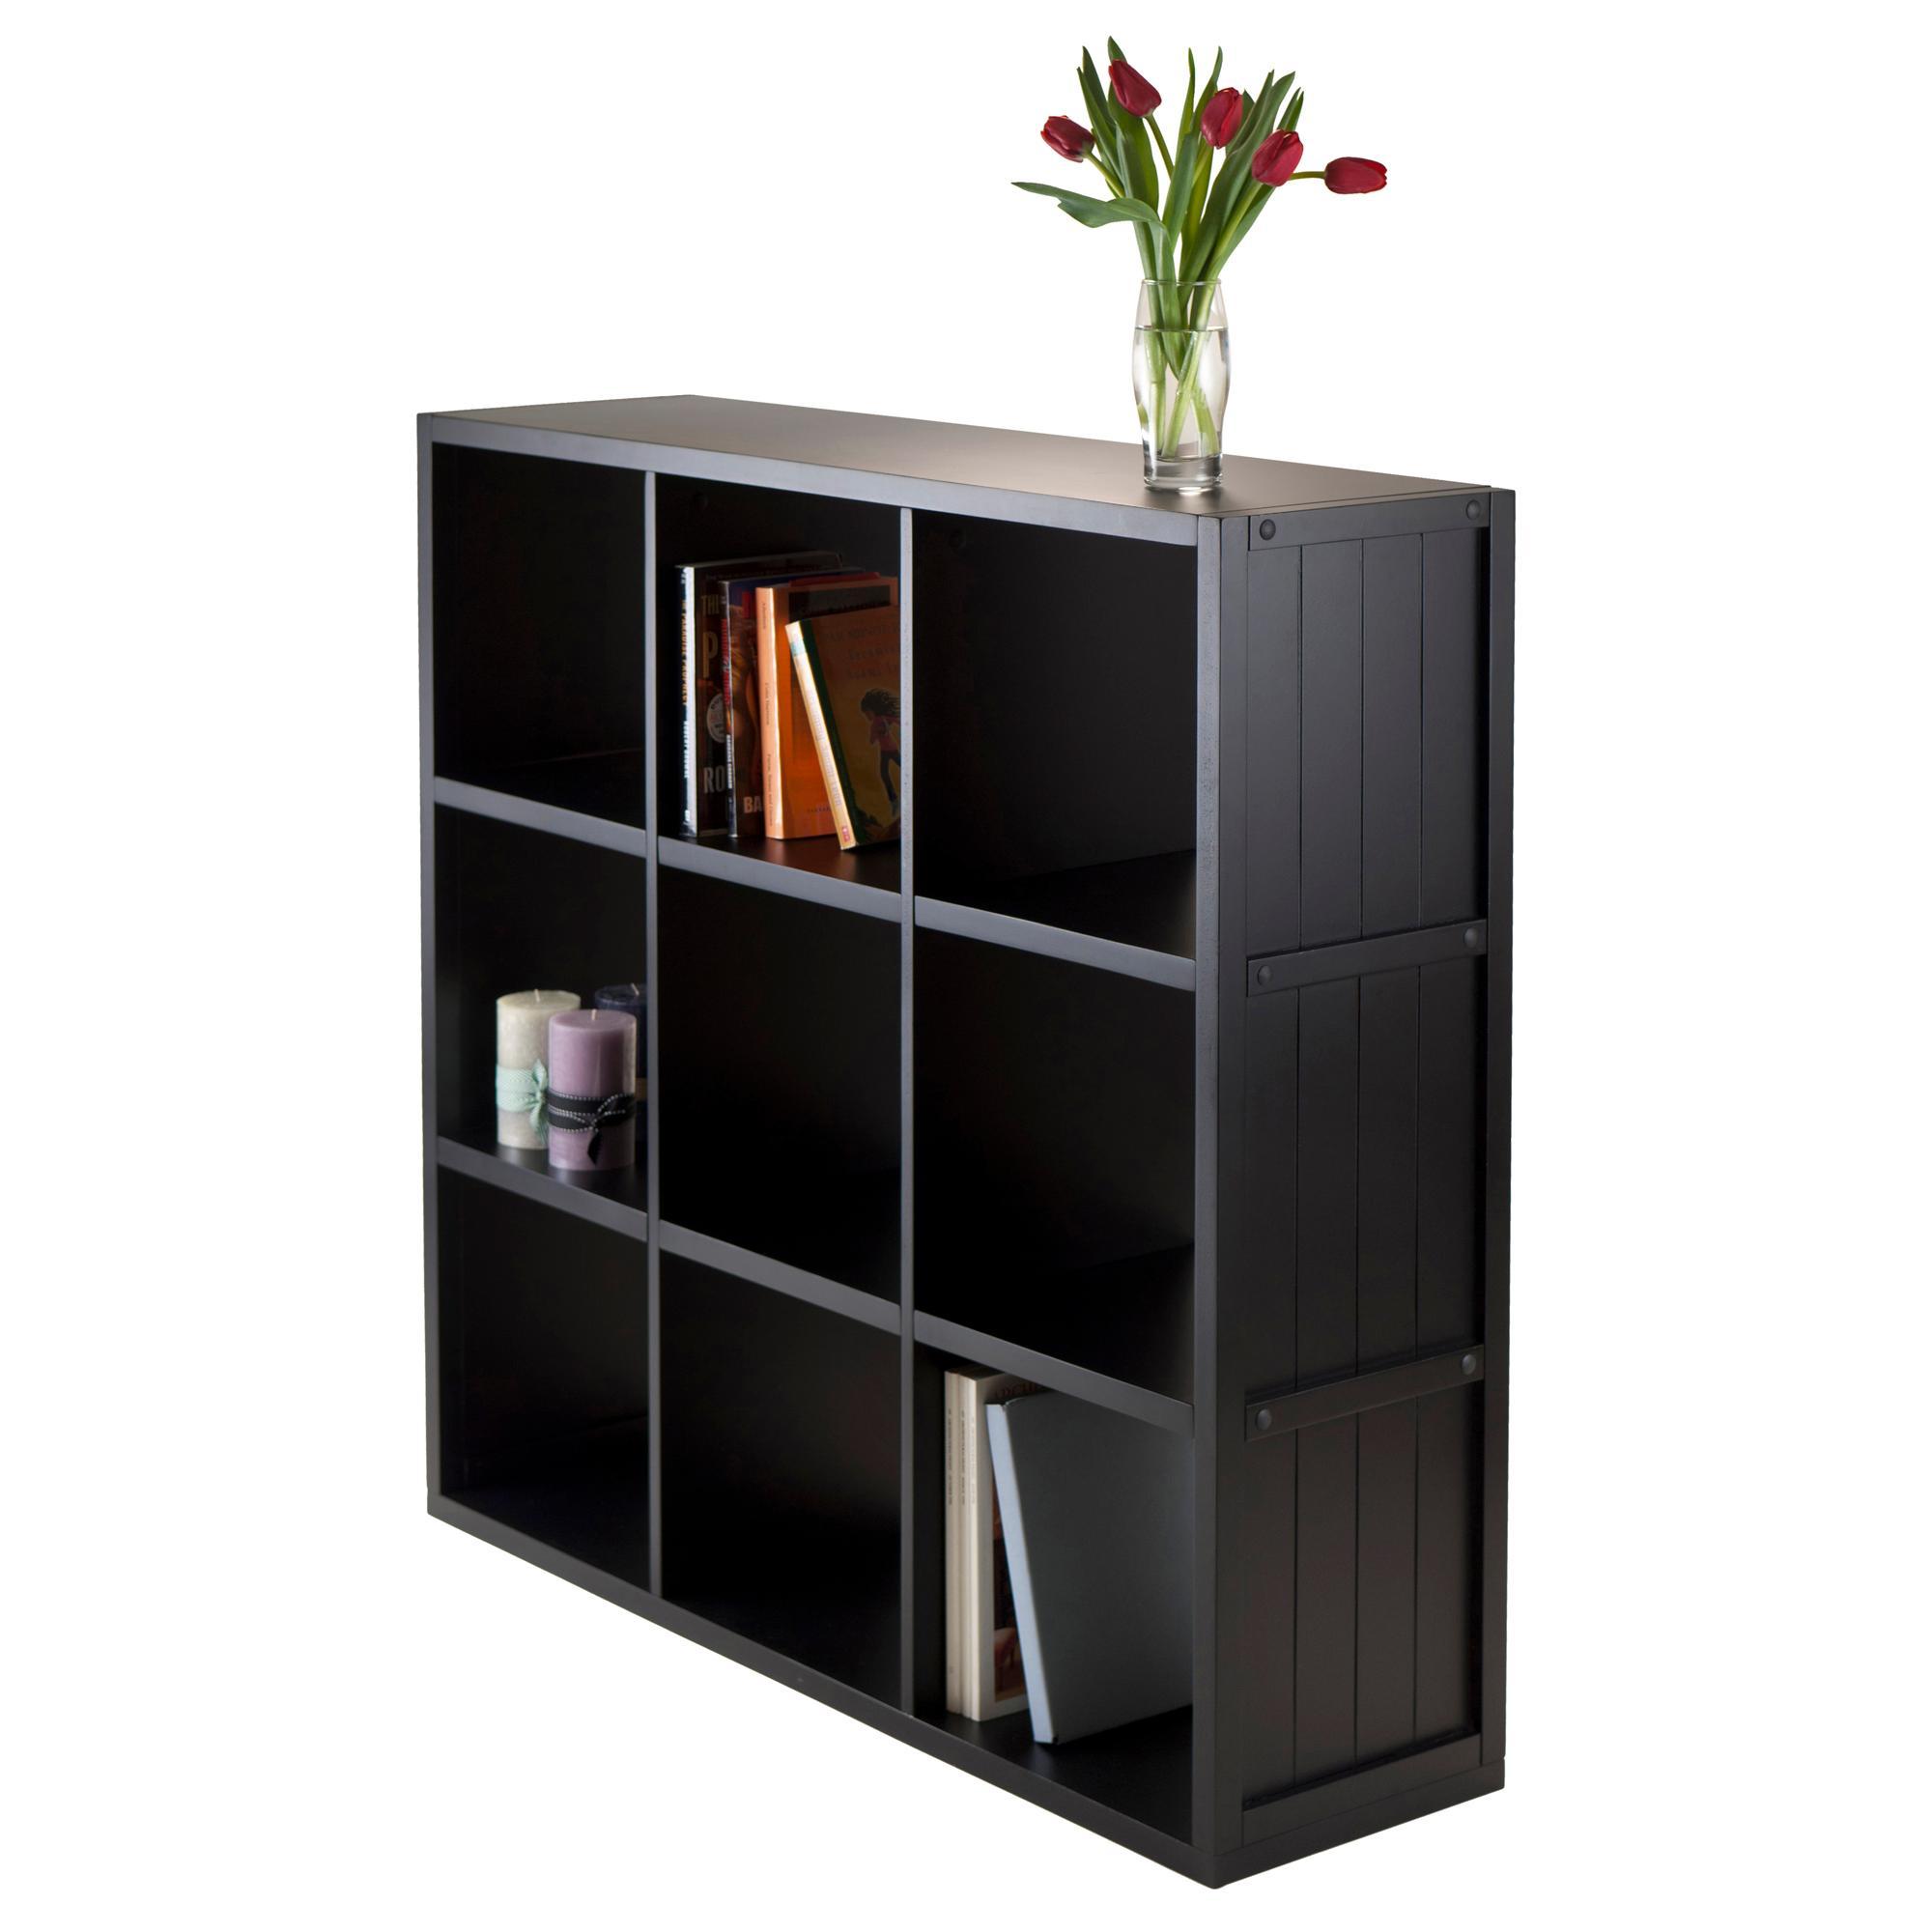 Kitchen Shelf Amazon: Amazon.com: Winsome Wood Shelf Cube Wainscoting Panel, 3